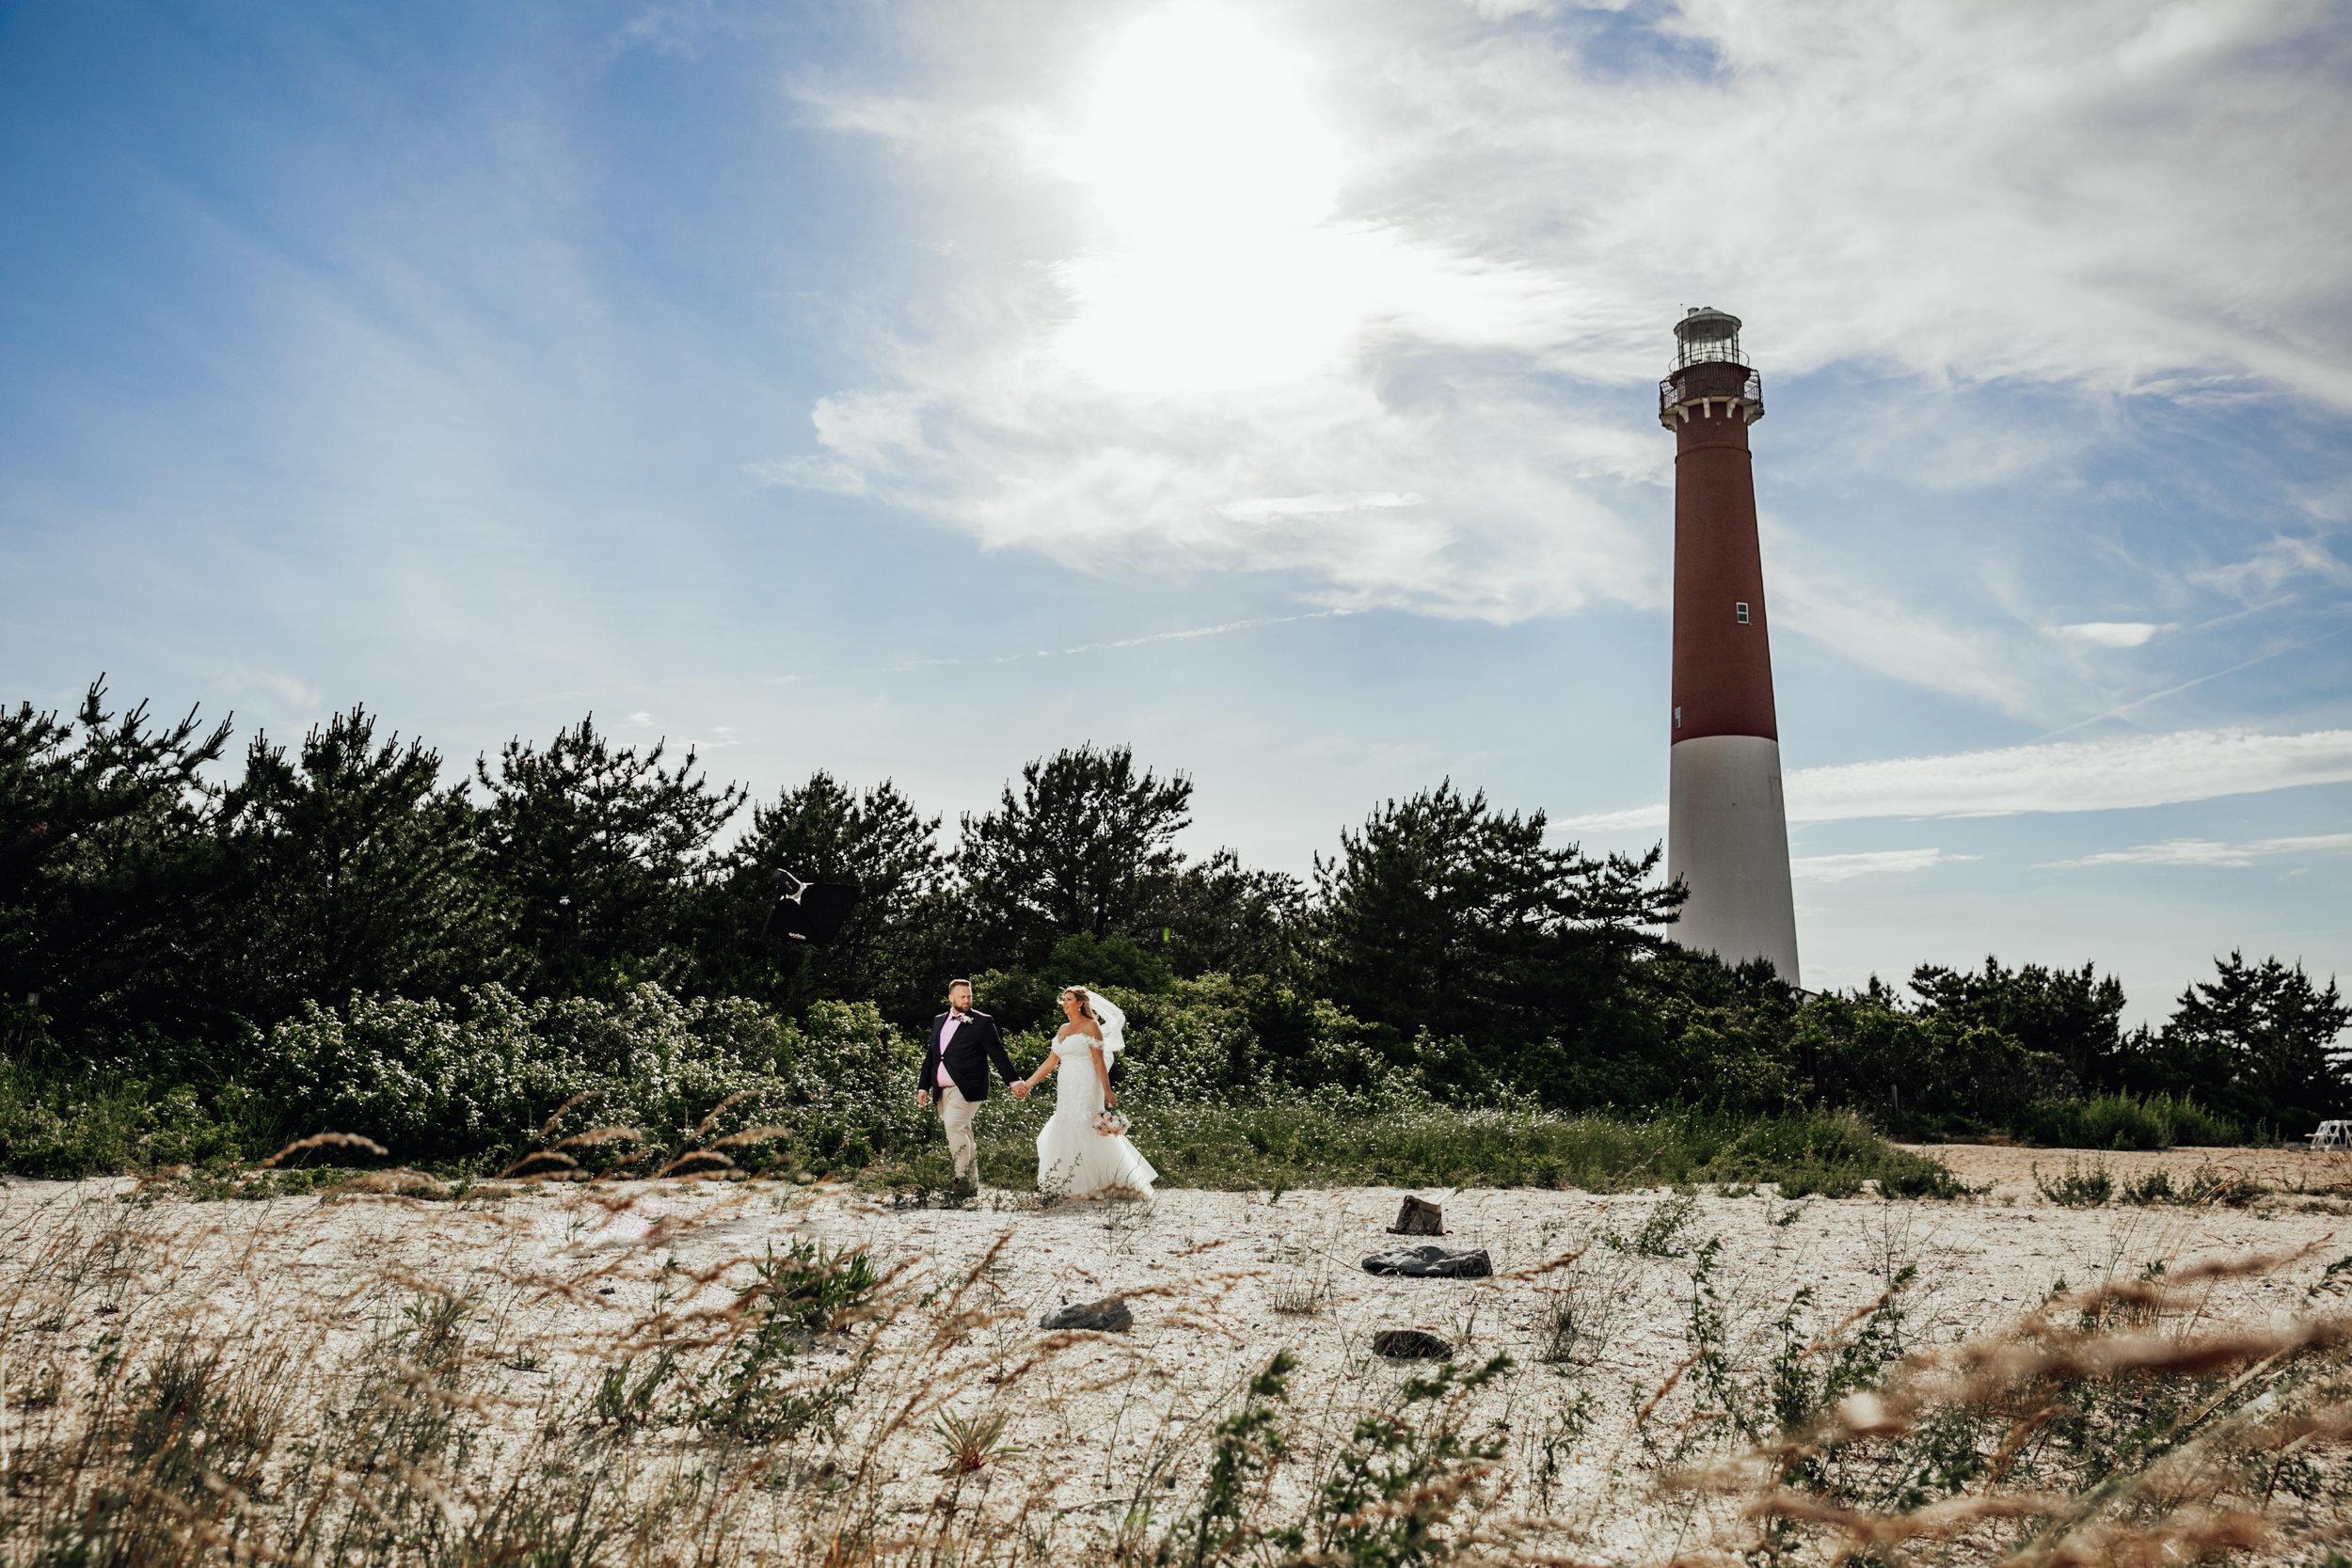 New Jersey Wedding Photographer, Felsberg Photography LBI wedding photography 86.jpg